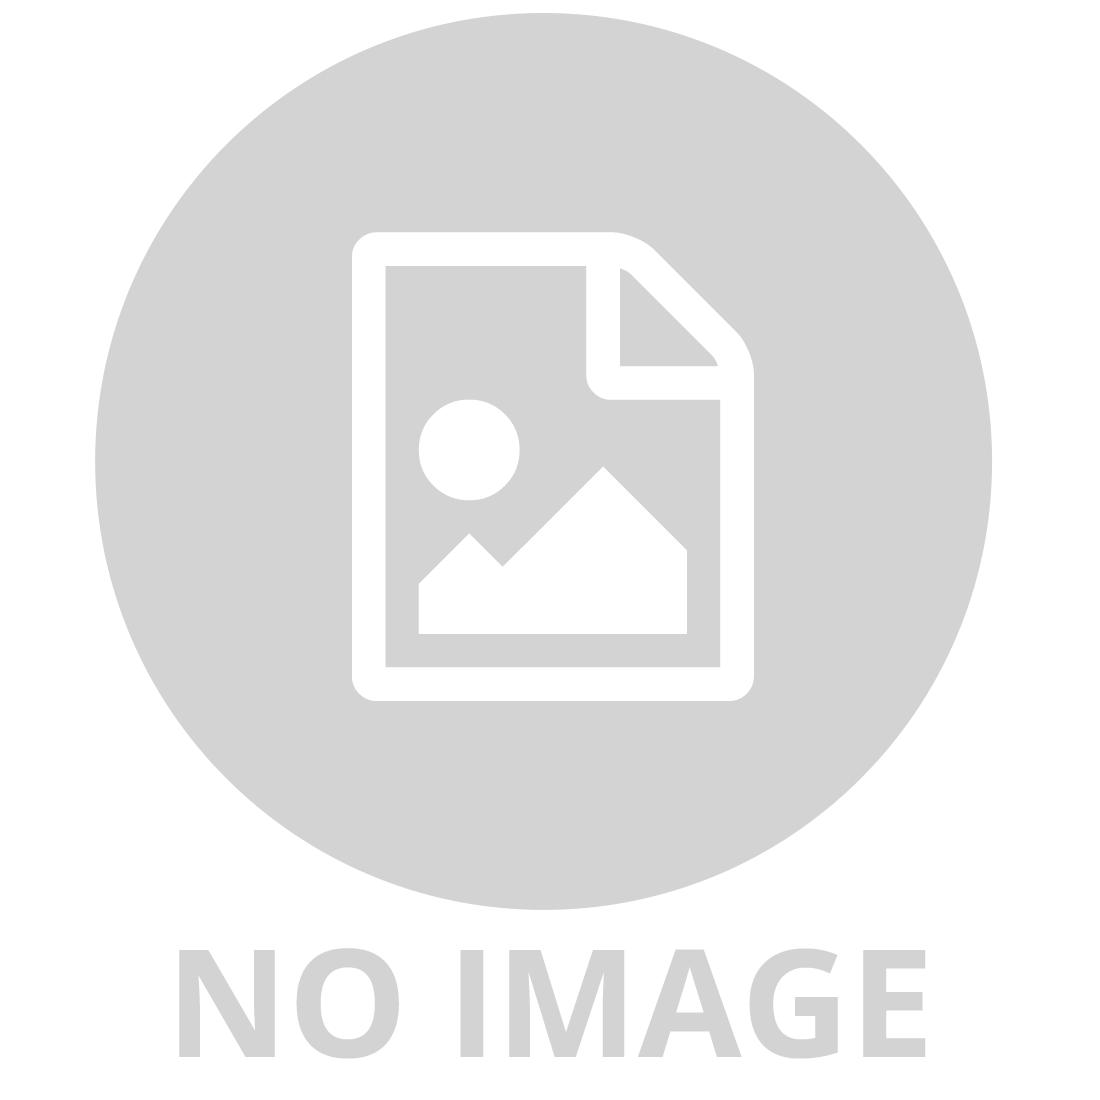 ROYAL BREEDS TRAVEL TRAILER